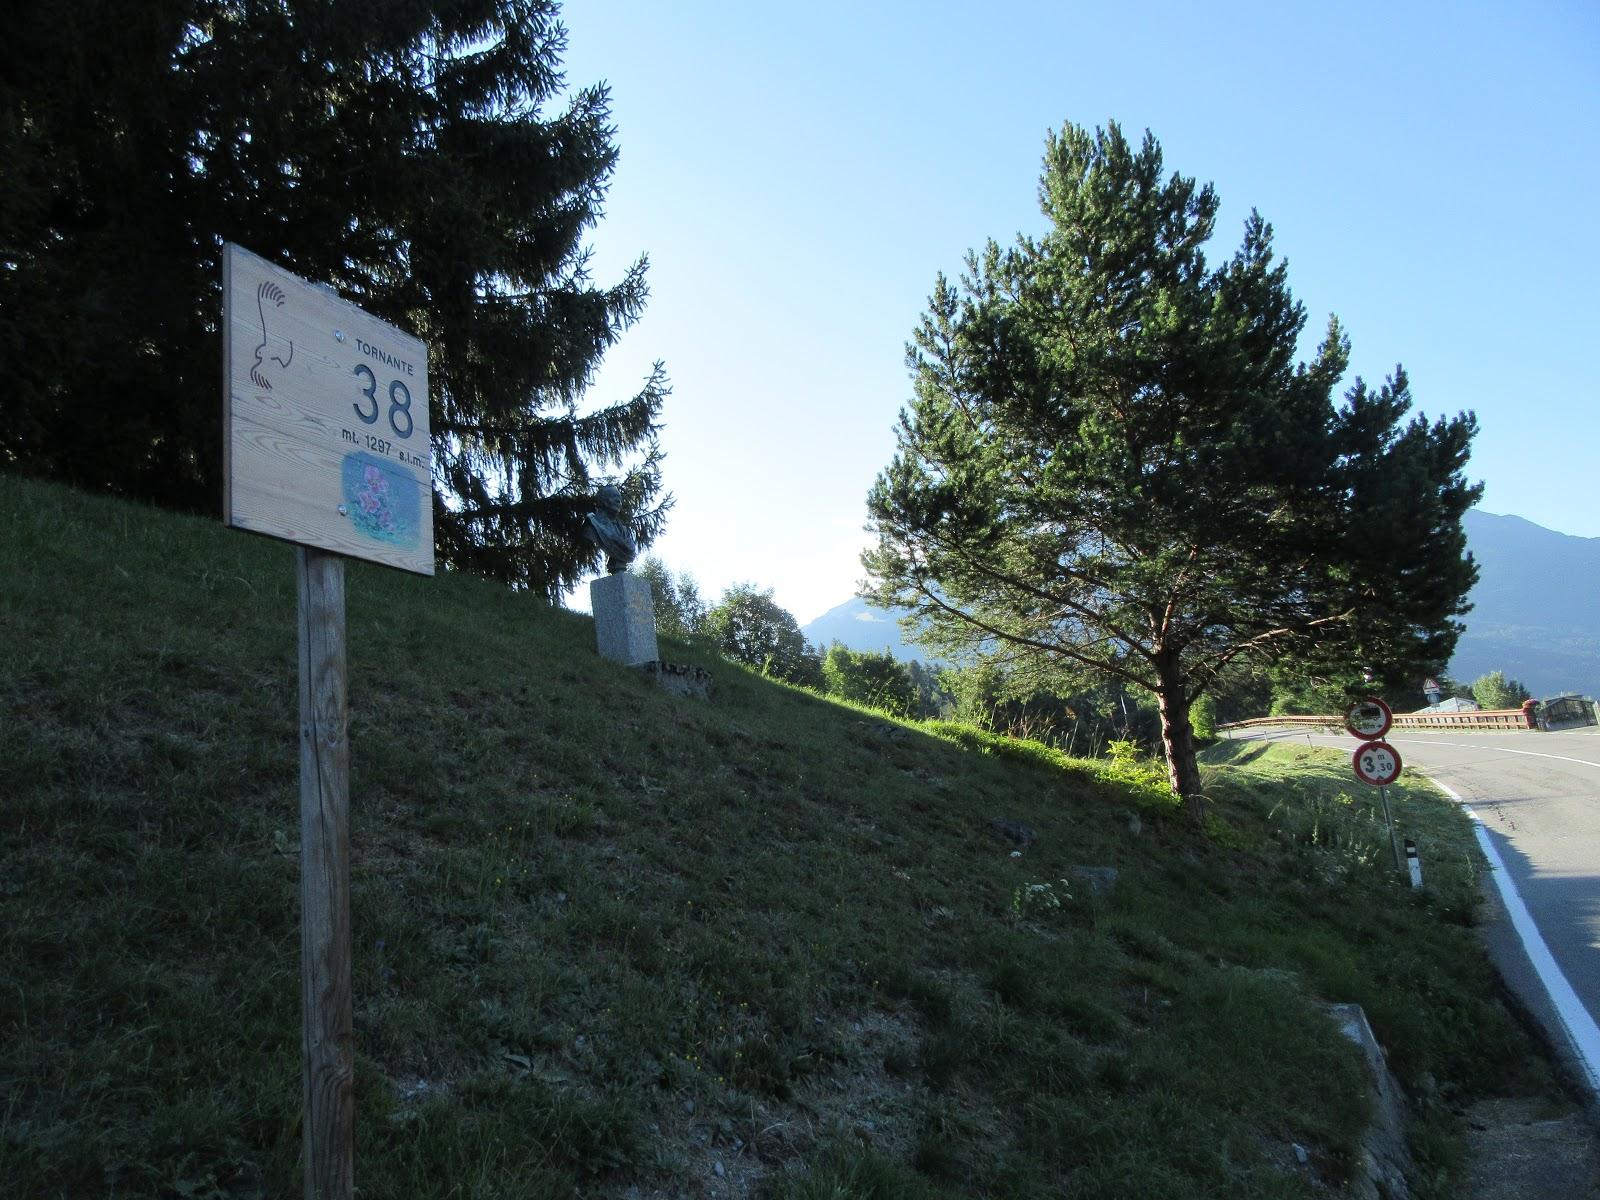 Passo dello Stelvio bike climb from Stelvio - photo off hairpin (tornante) 38